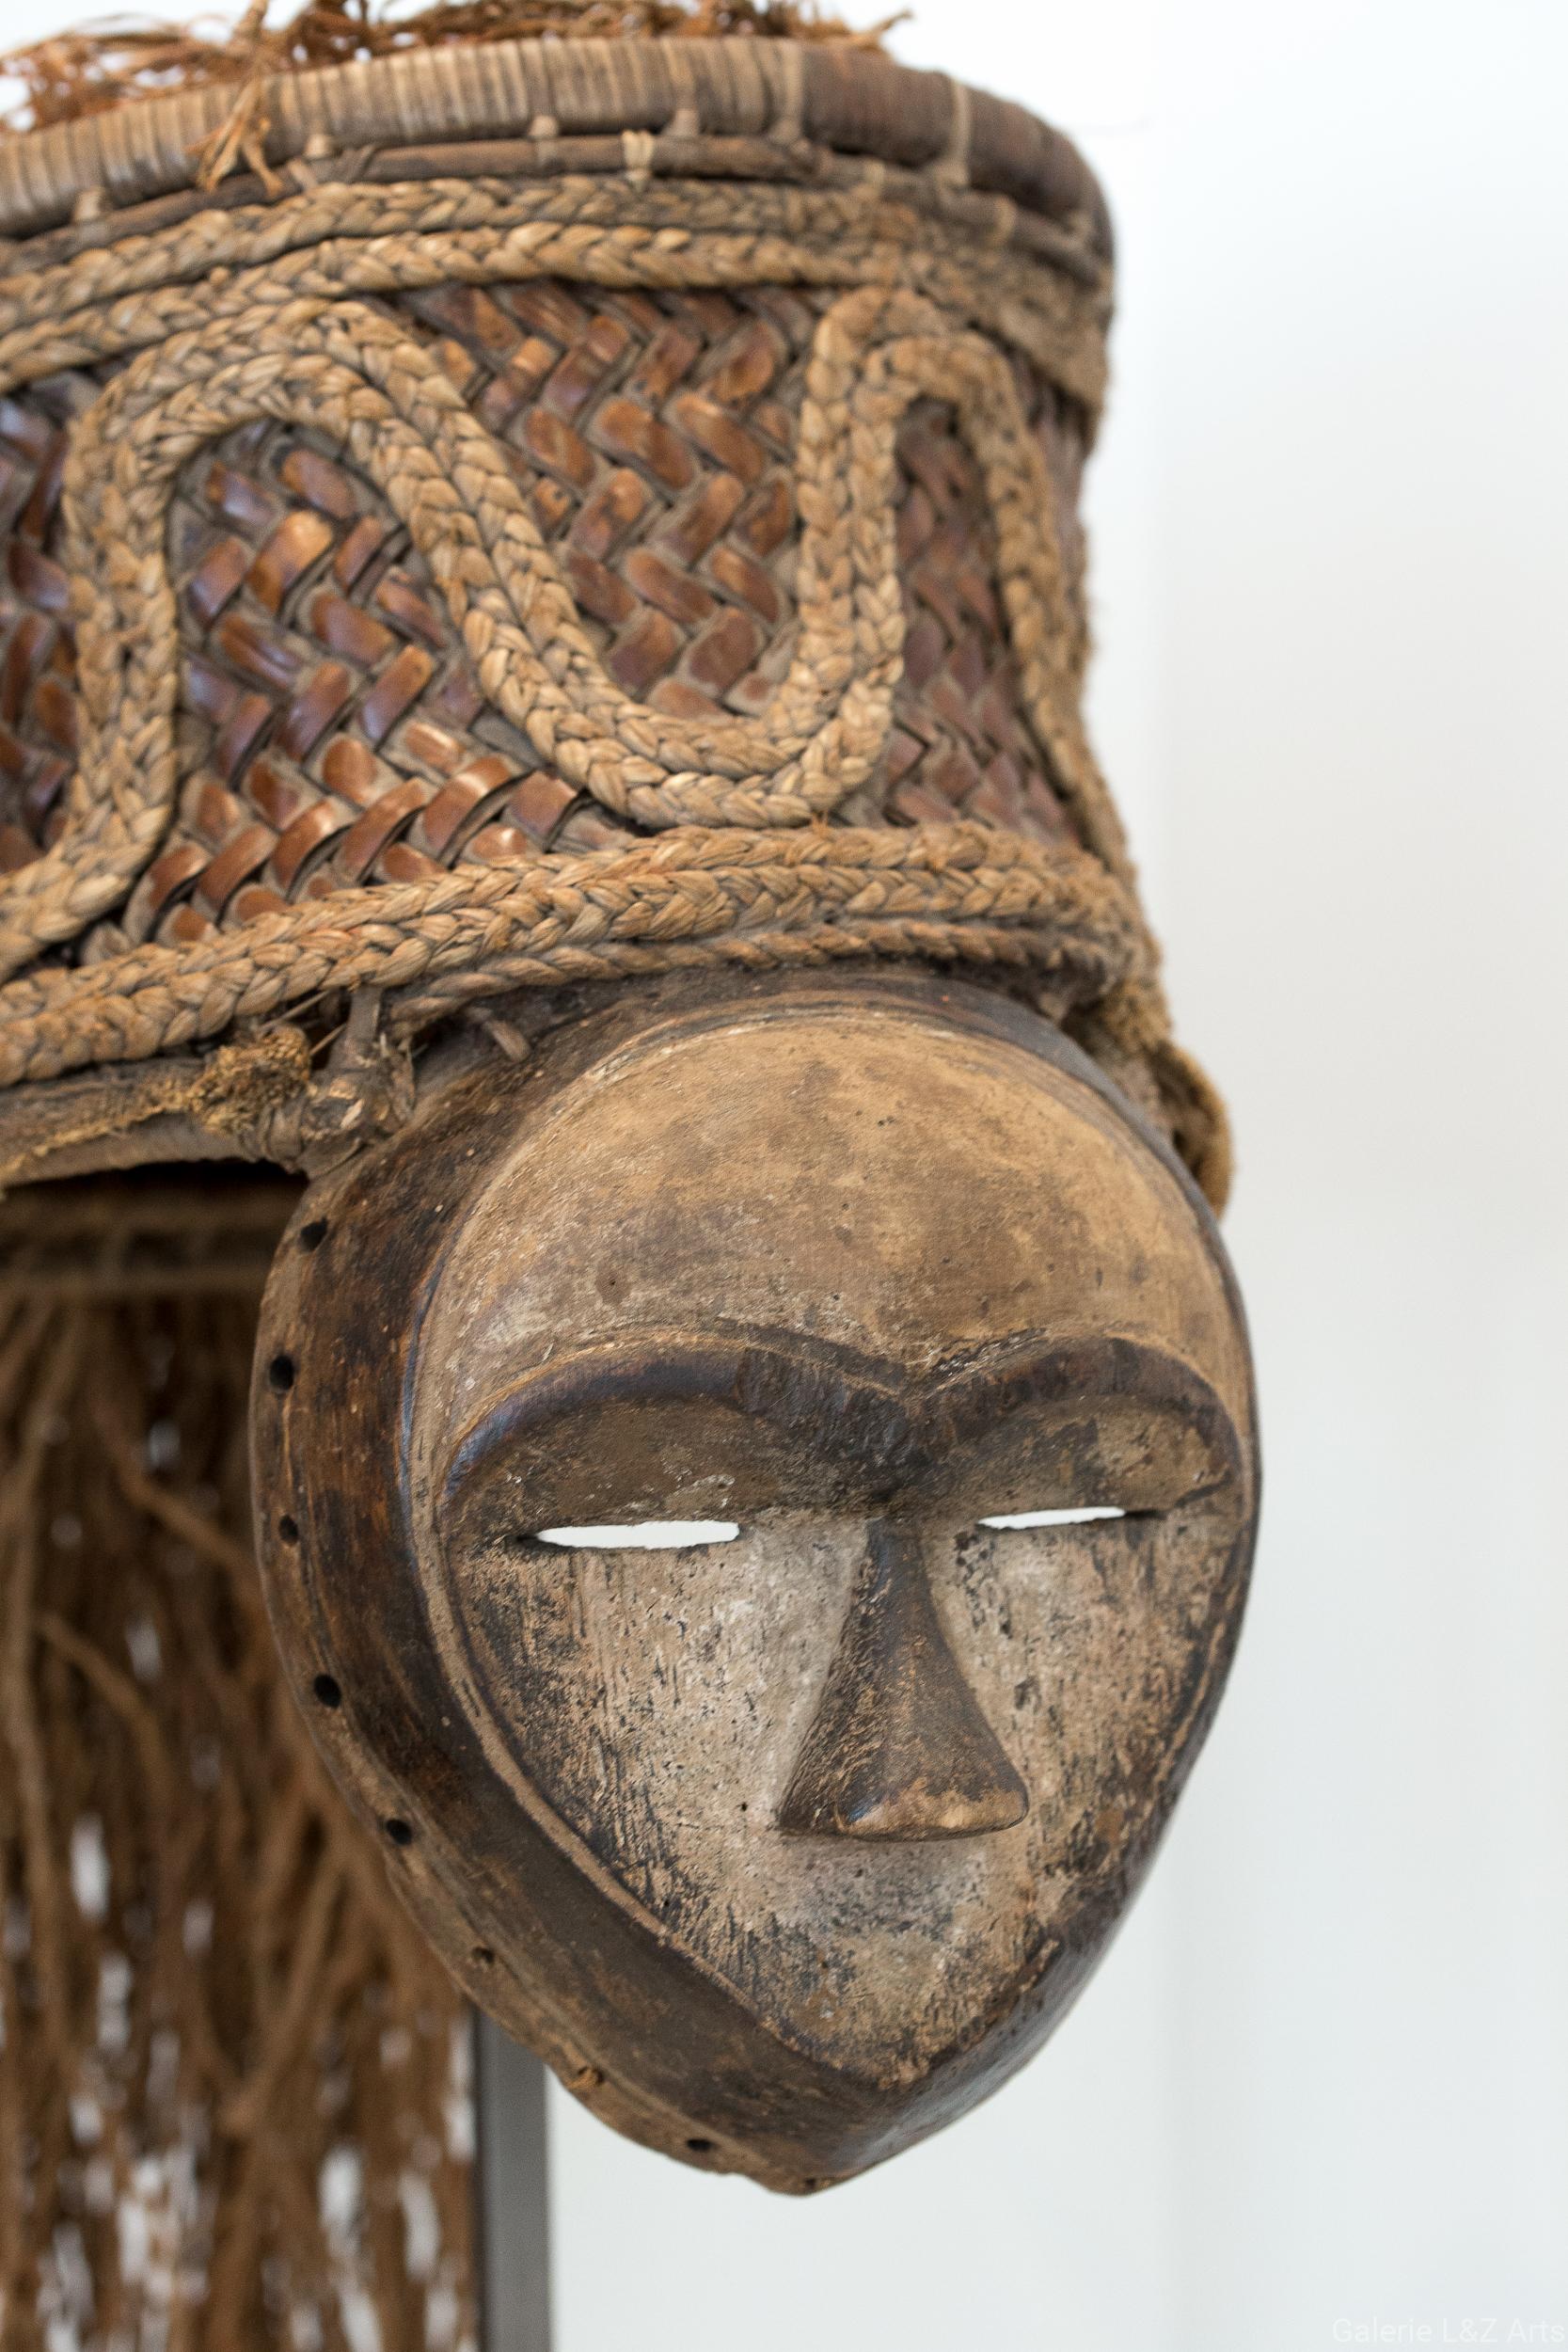 tribal-art-oostende-ostende-exposition-galerie-lz-art-africain-belgique-9.jpg